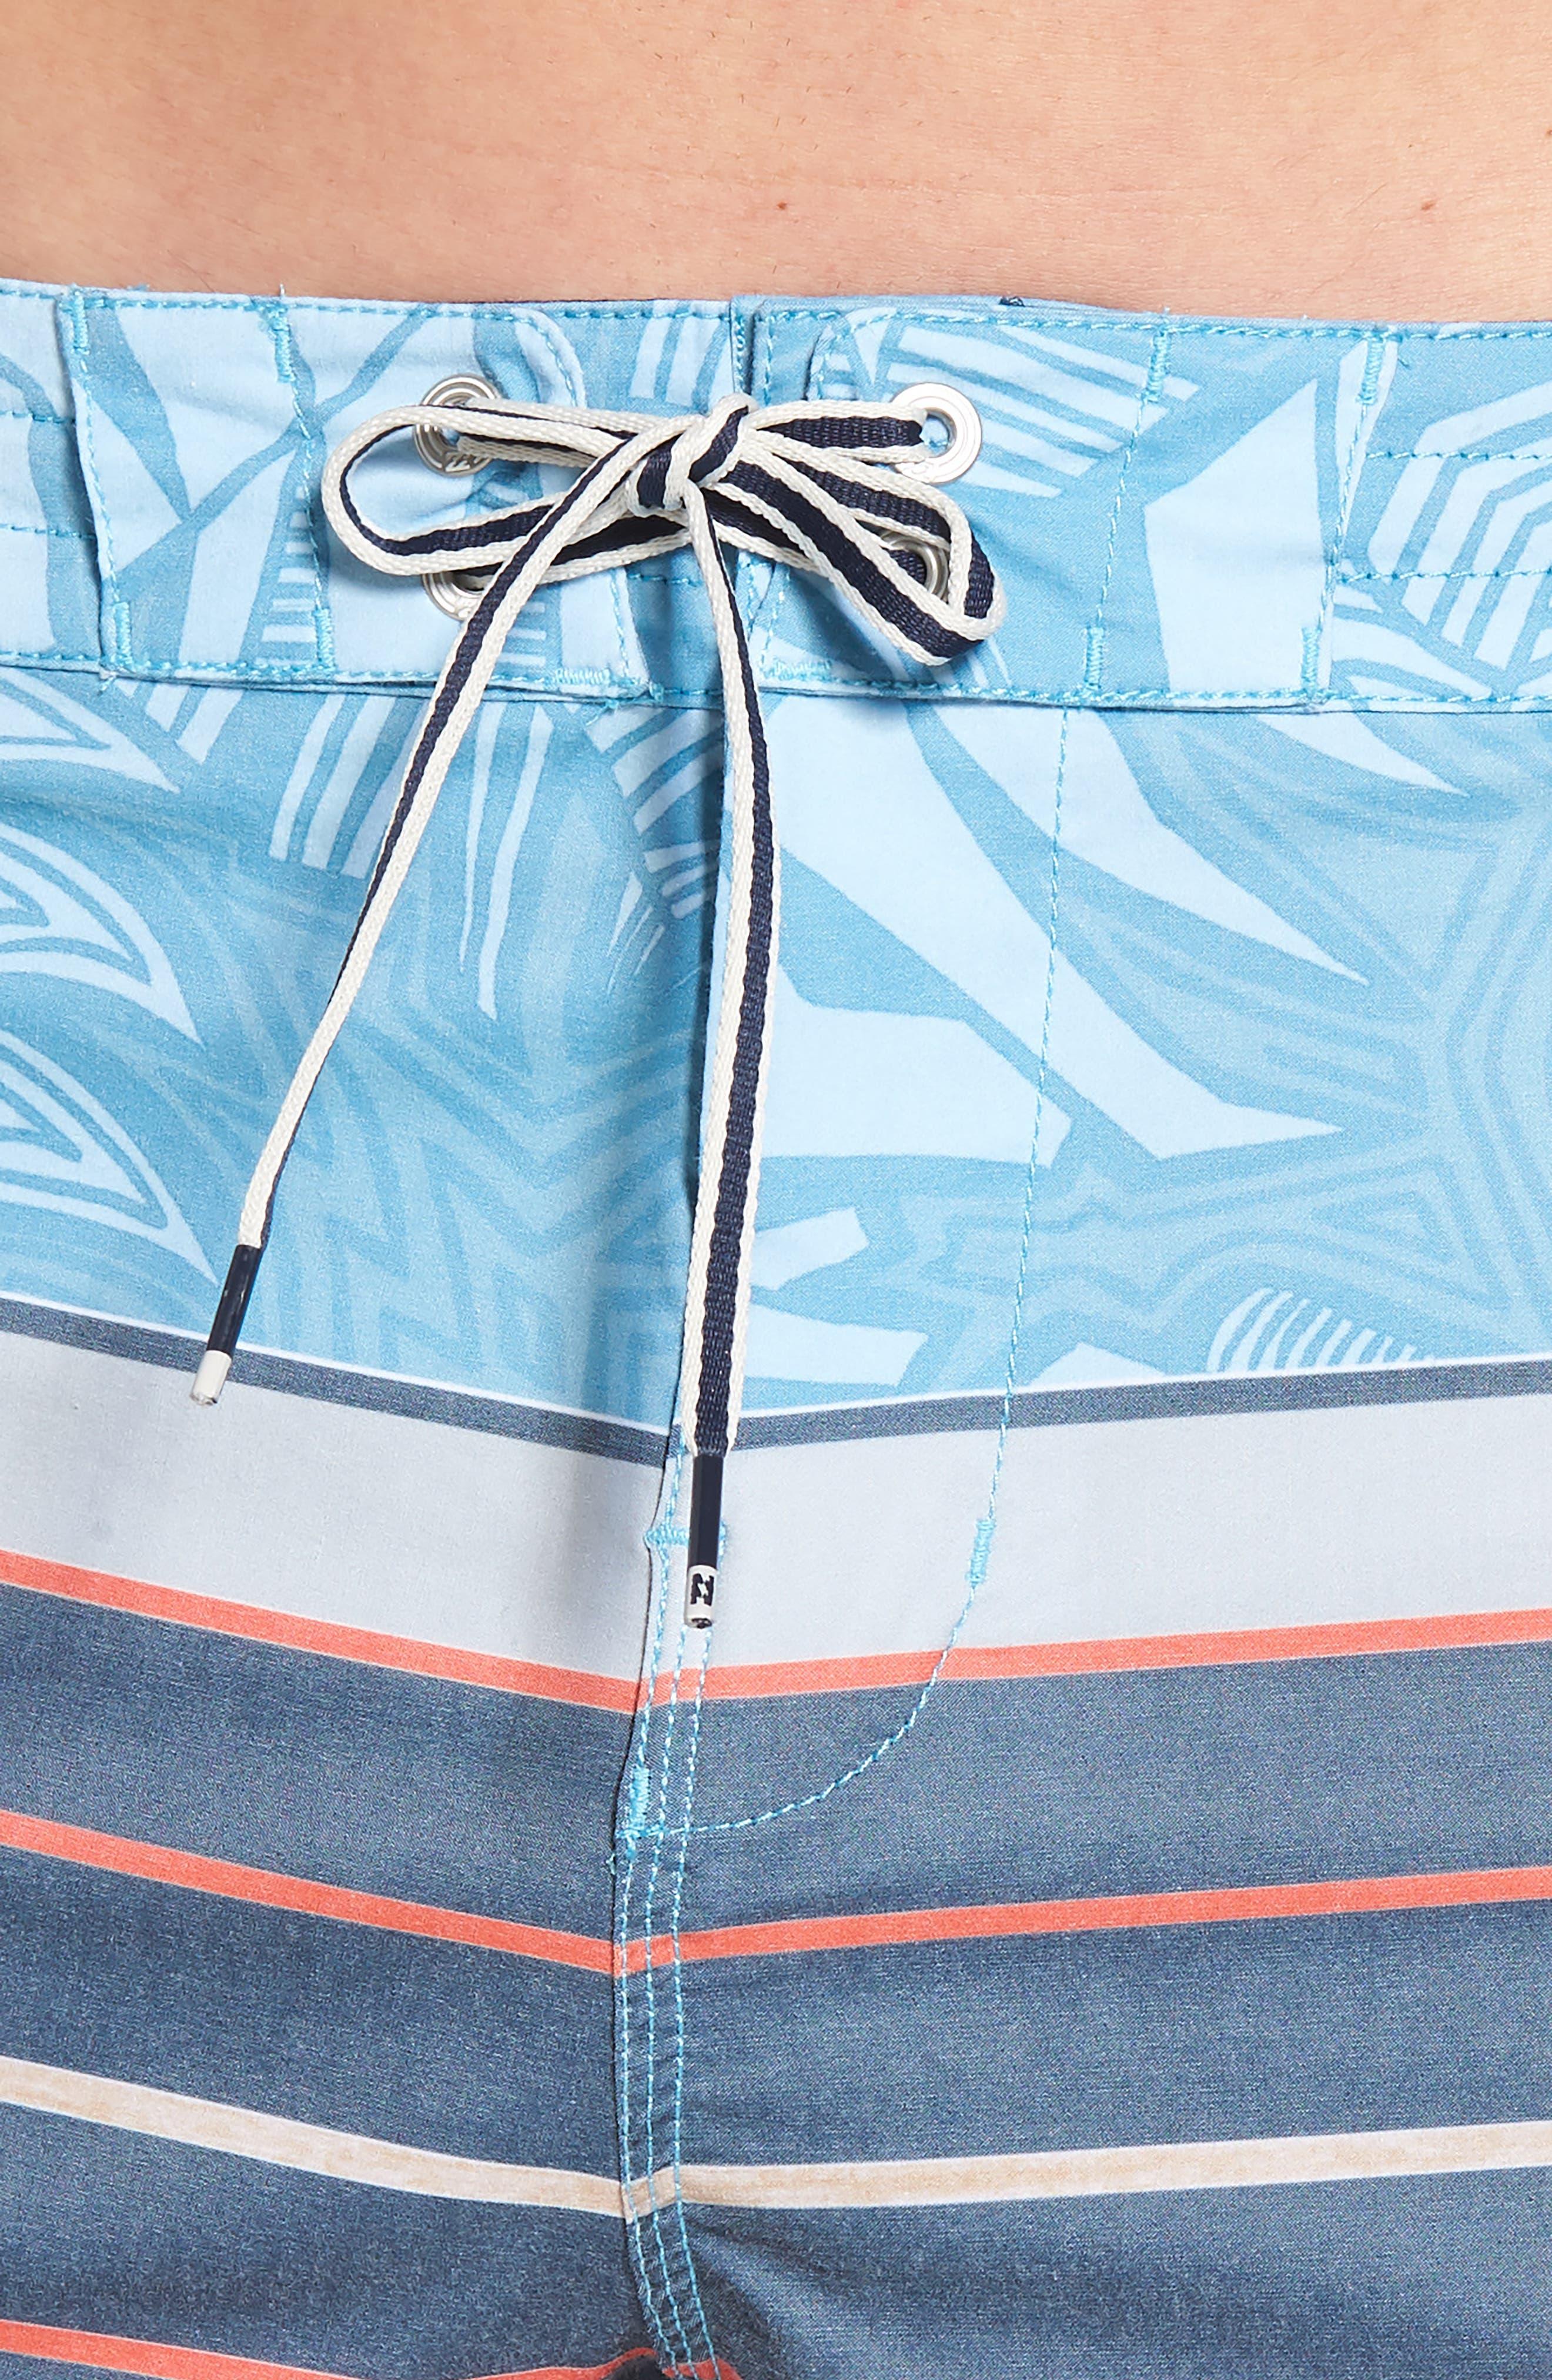 Stringer Lo Tides Board Shorts,                             Alternate thumbnail 4, color,                             Blue